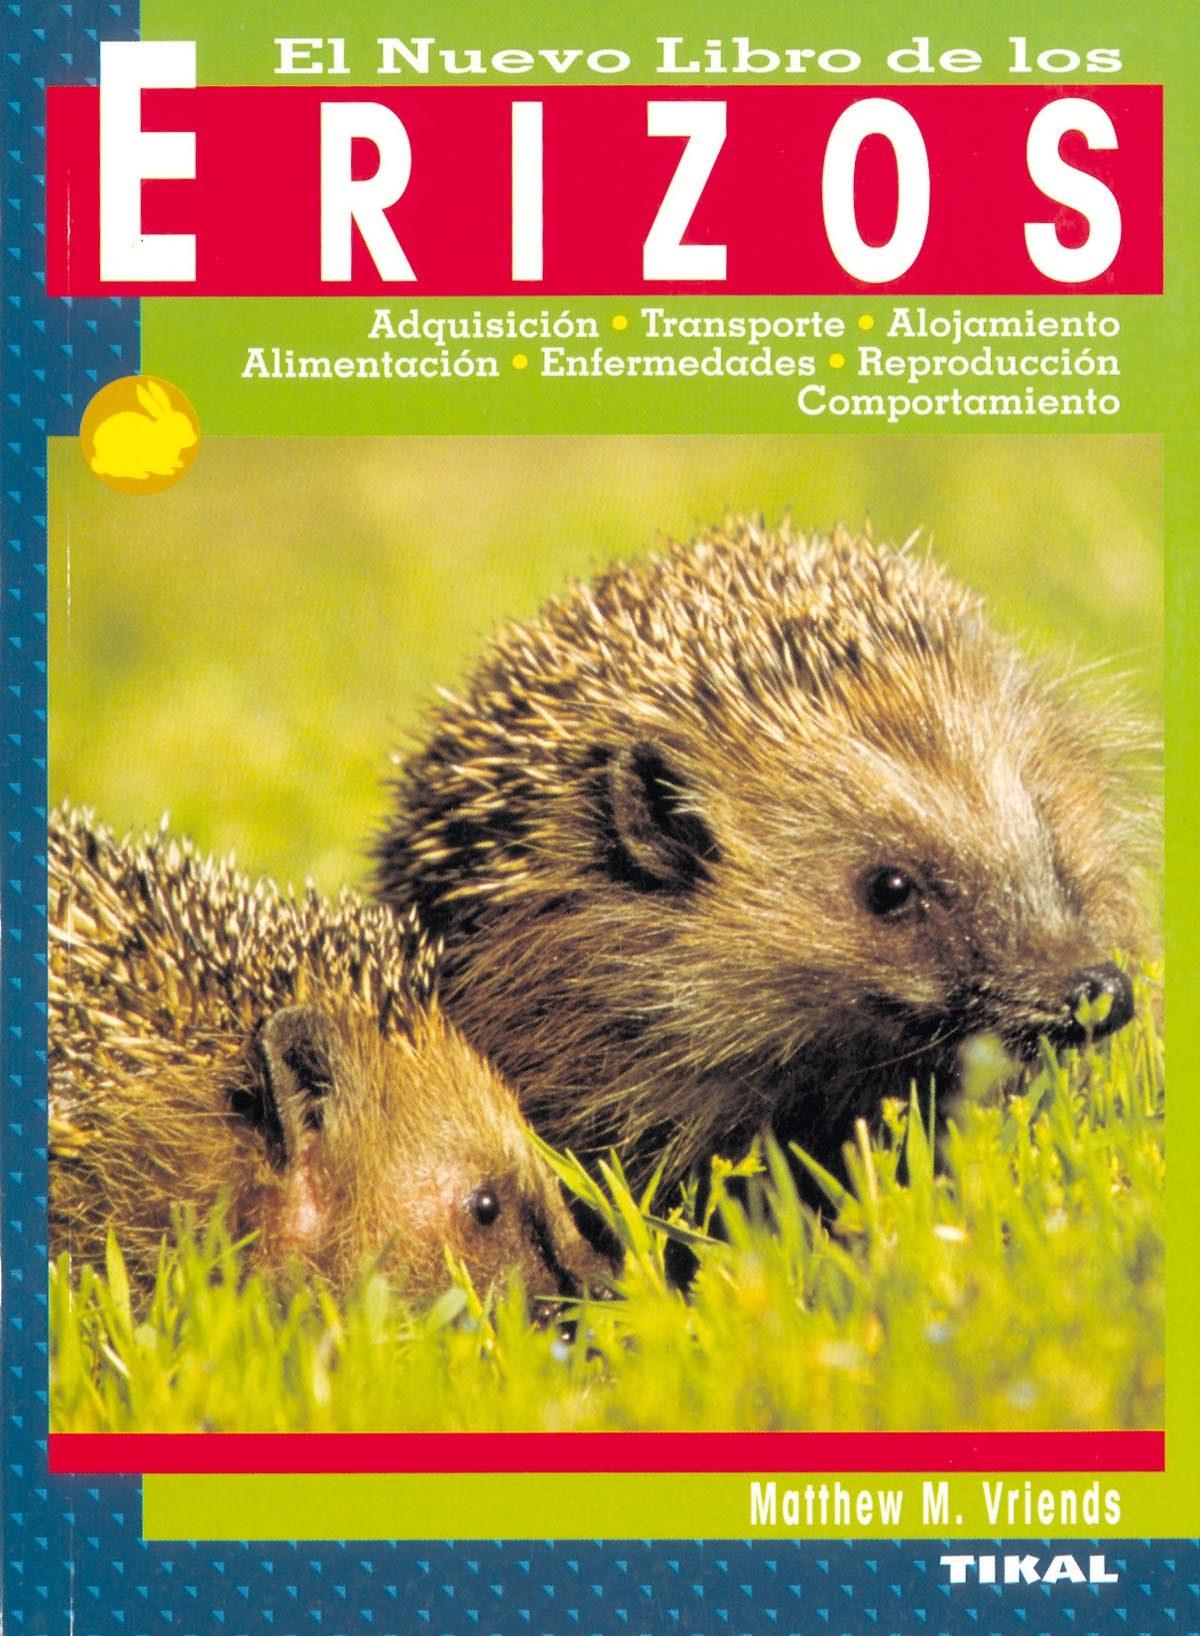 Erizos 9788430535569